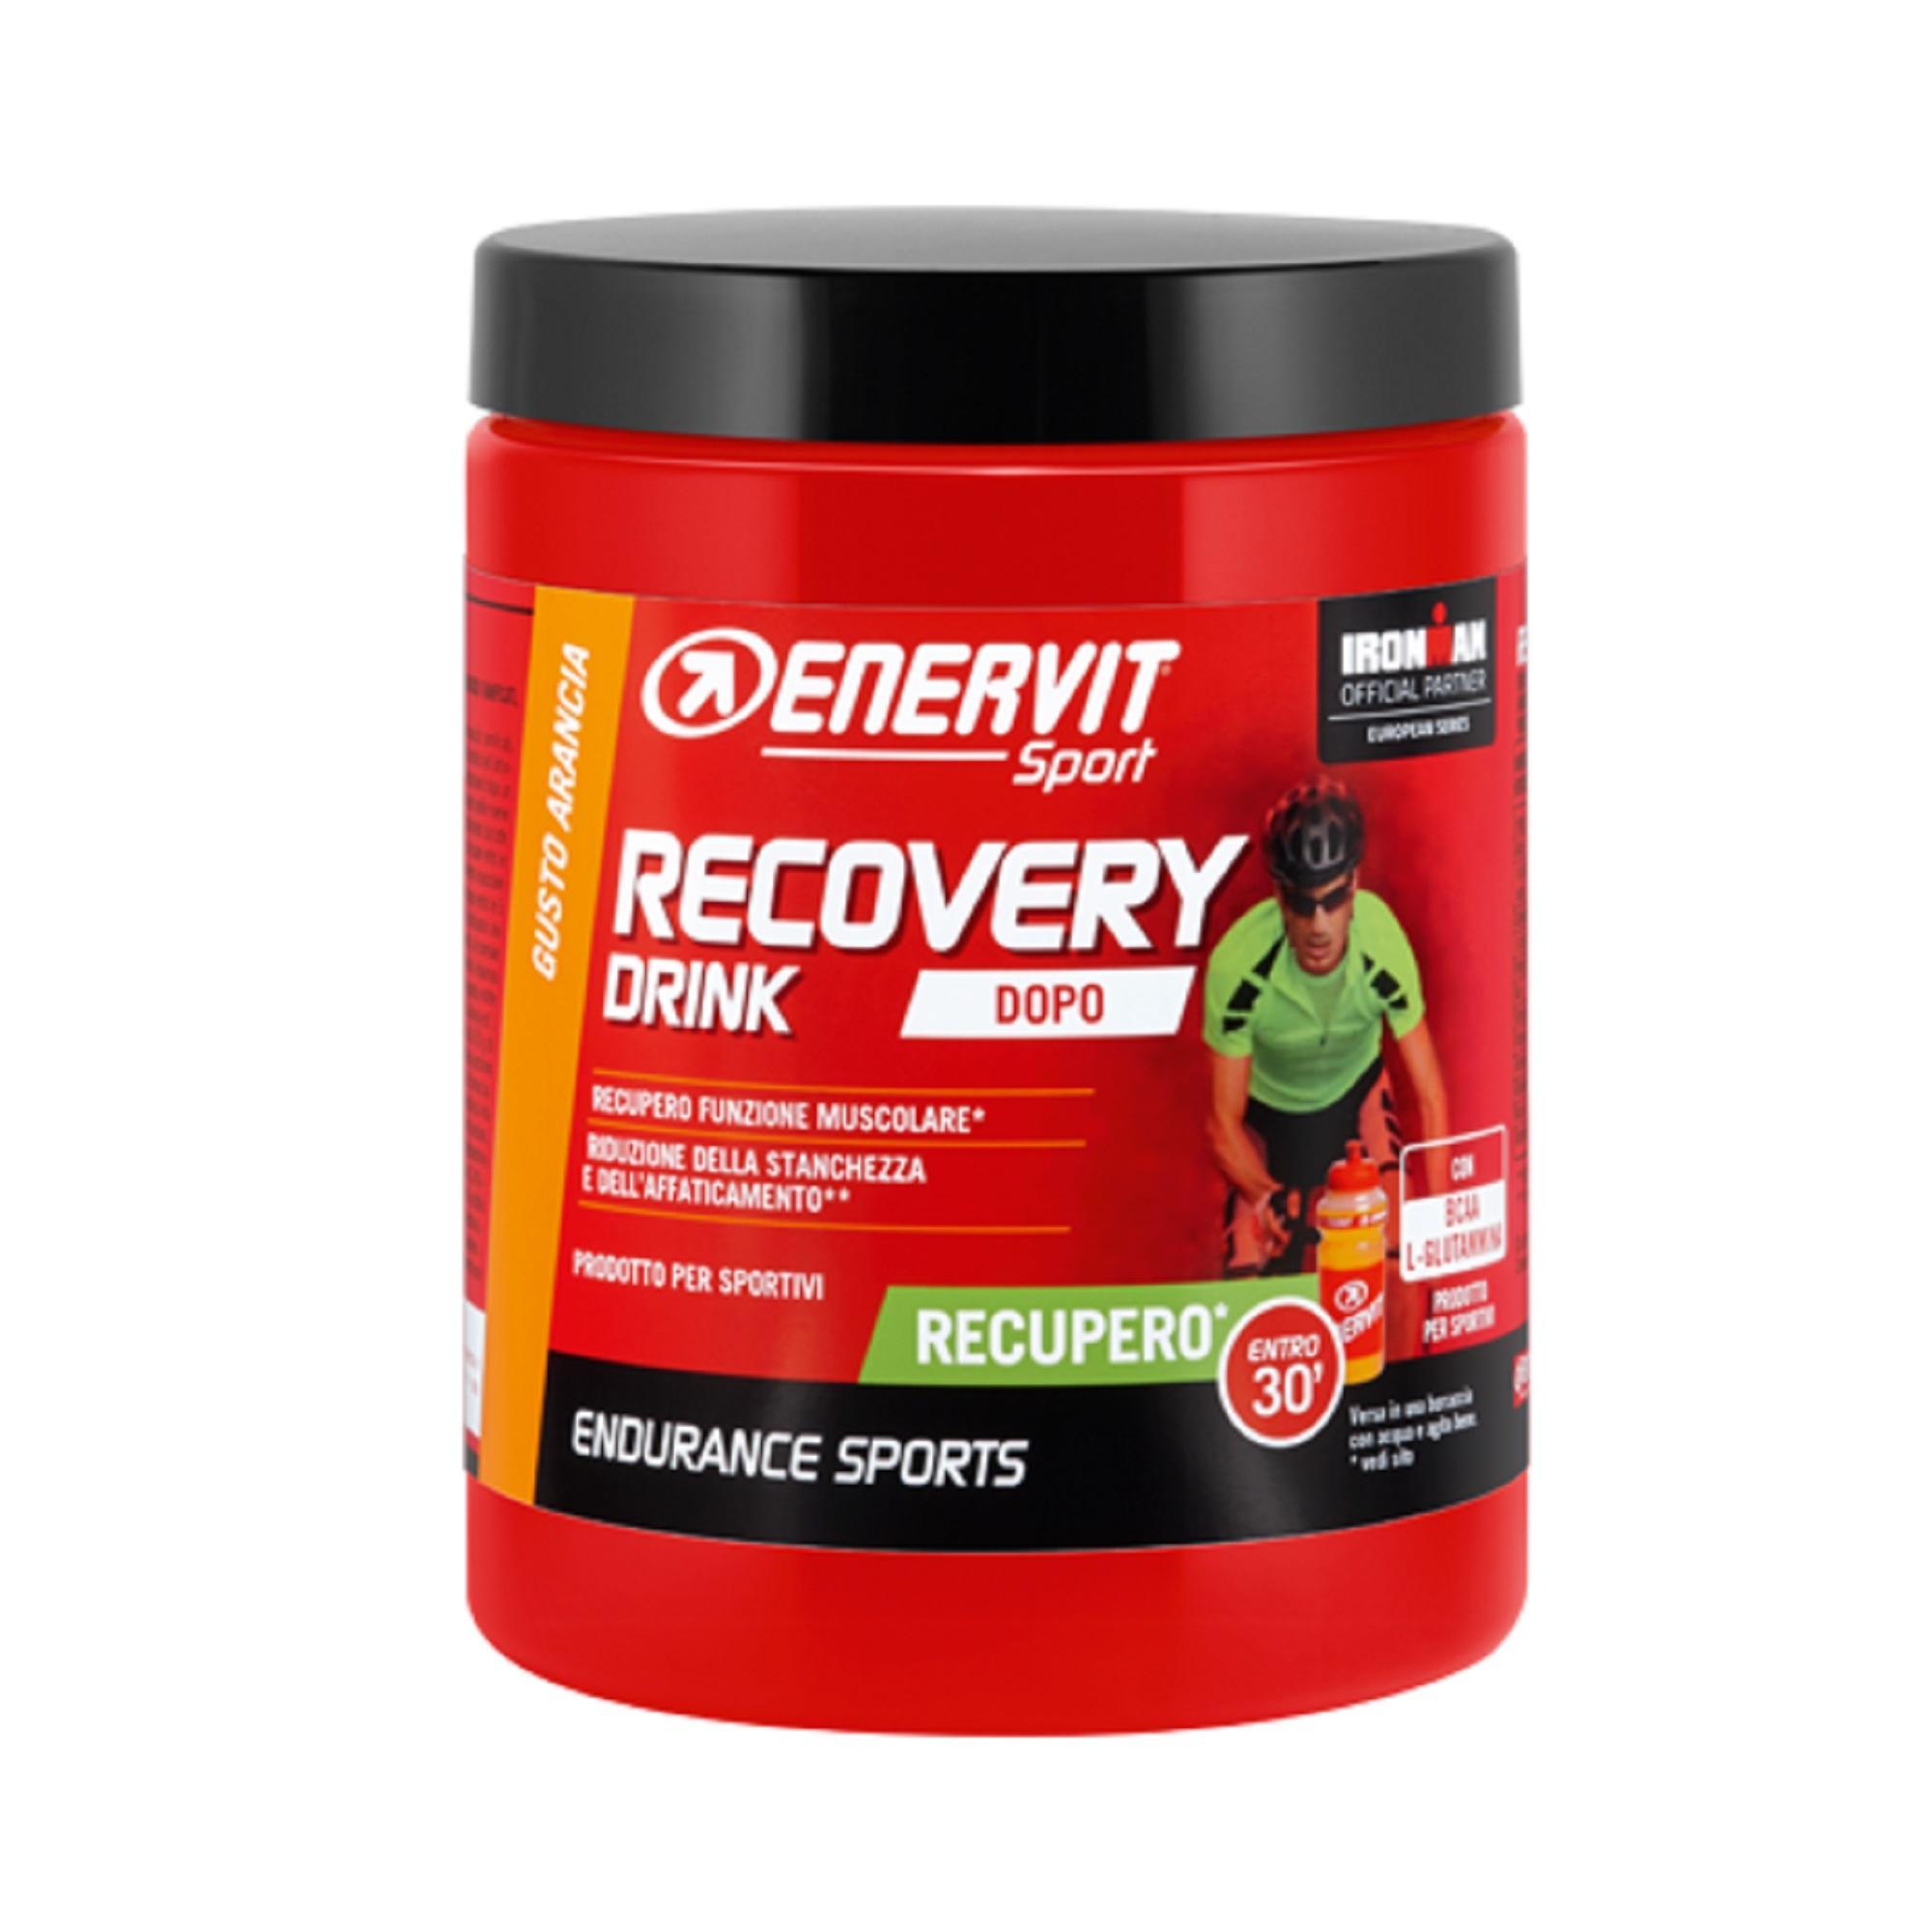 ENERVIT. Bevanda per il recupero in polvere Recovery drink R2 Sport Arancia 400g Enervit